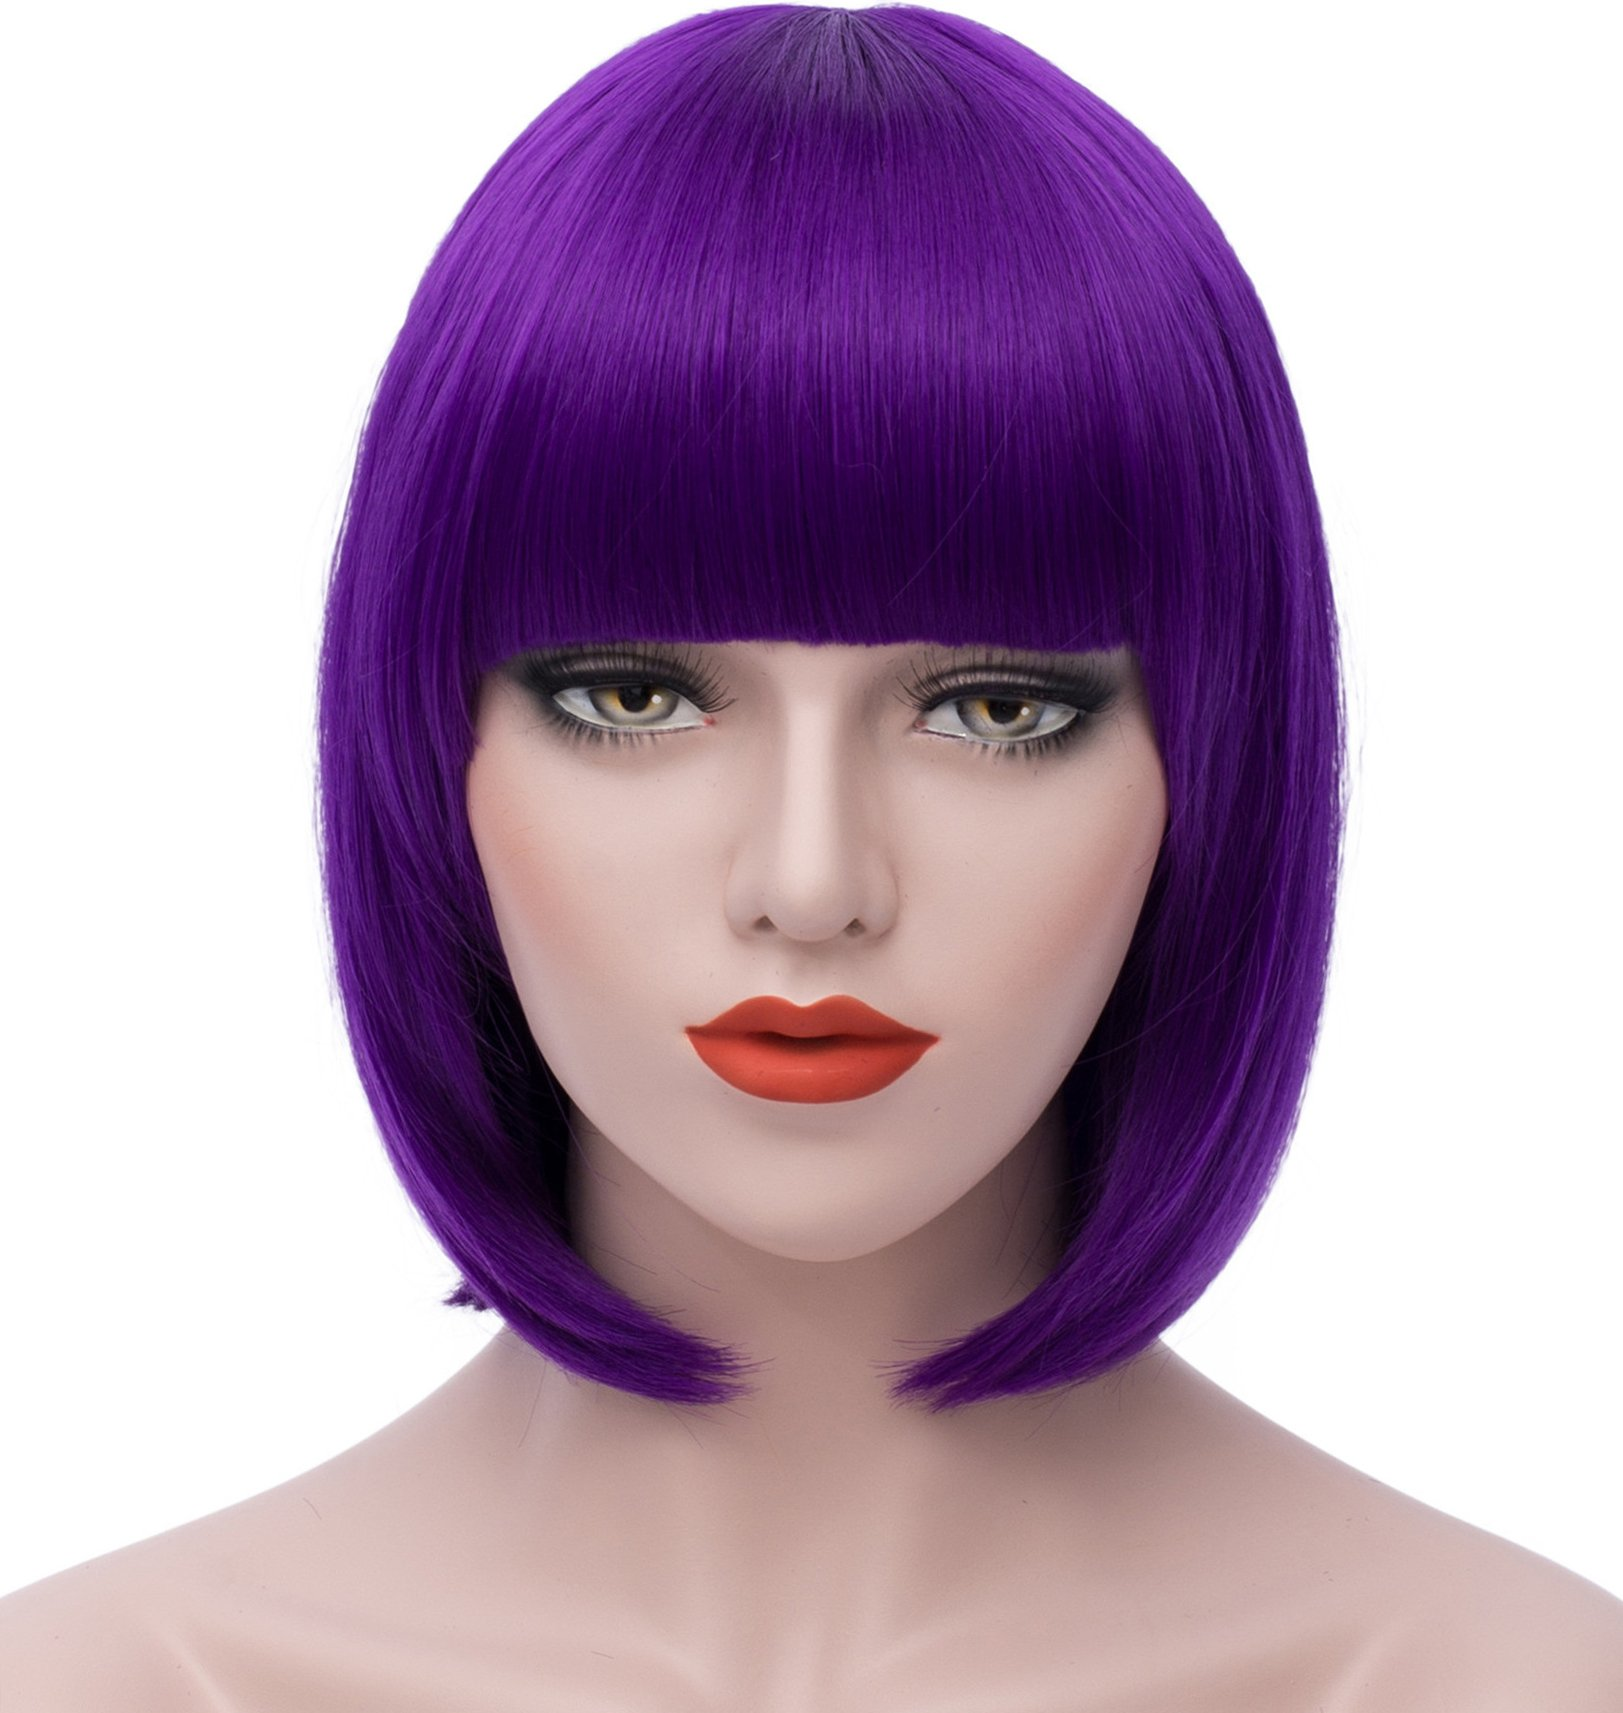 Women's Wigs Bob Wig - Purple Cosplay Wigs 12'' Short Straight Wig Bangs Wig Synthetic Wigs for Women S004PR